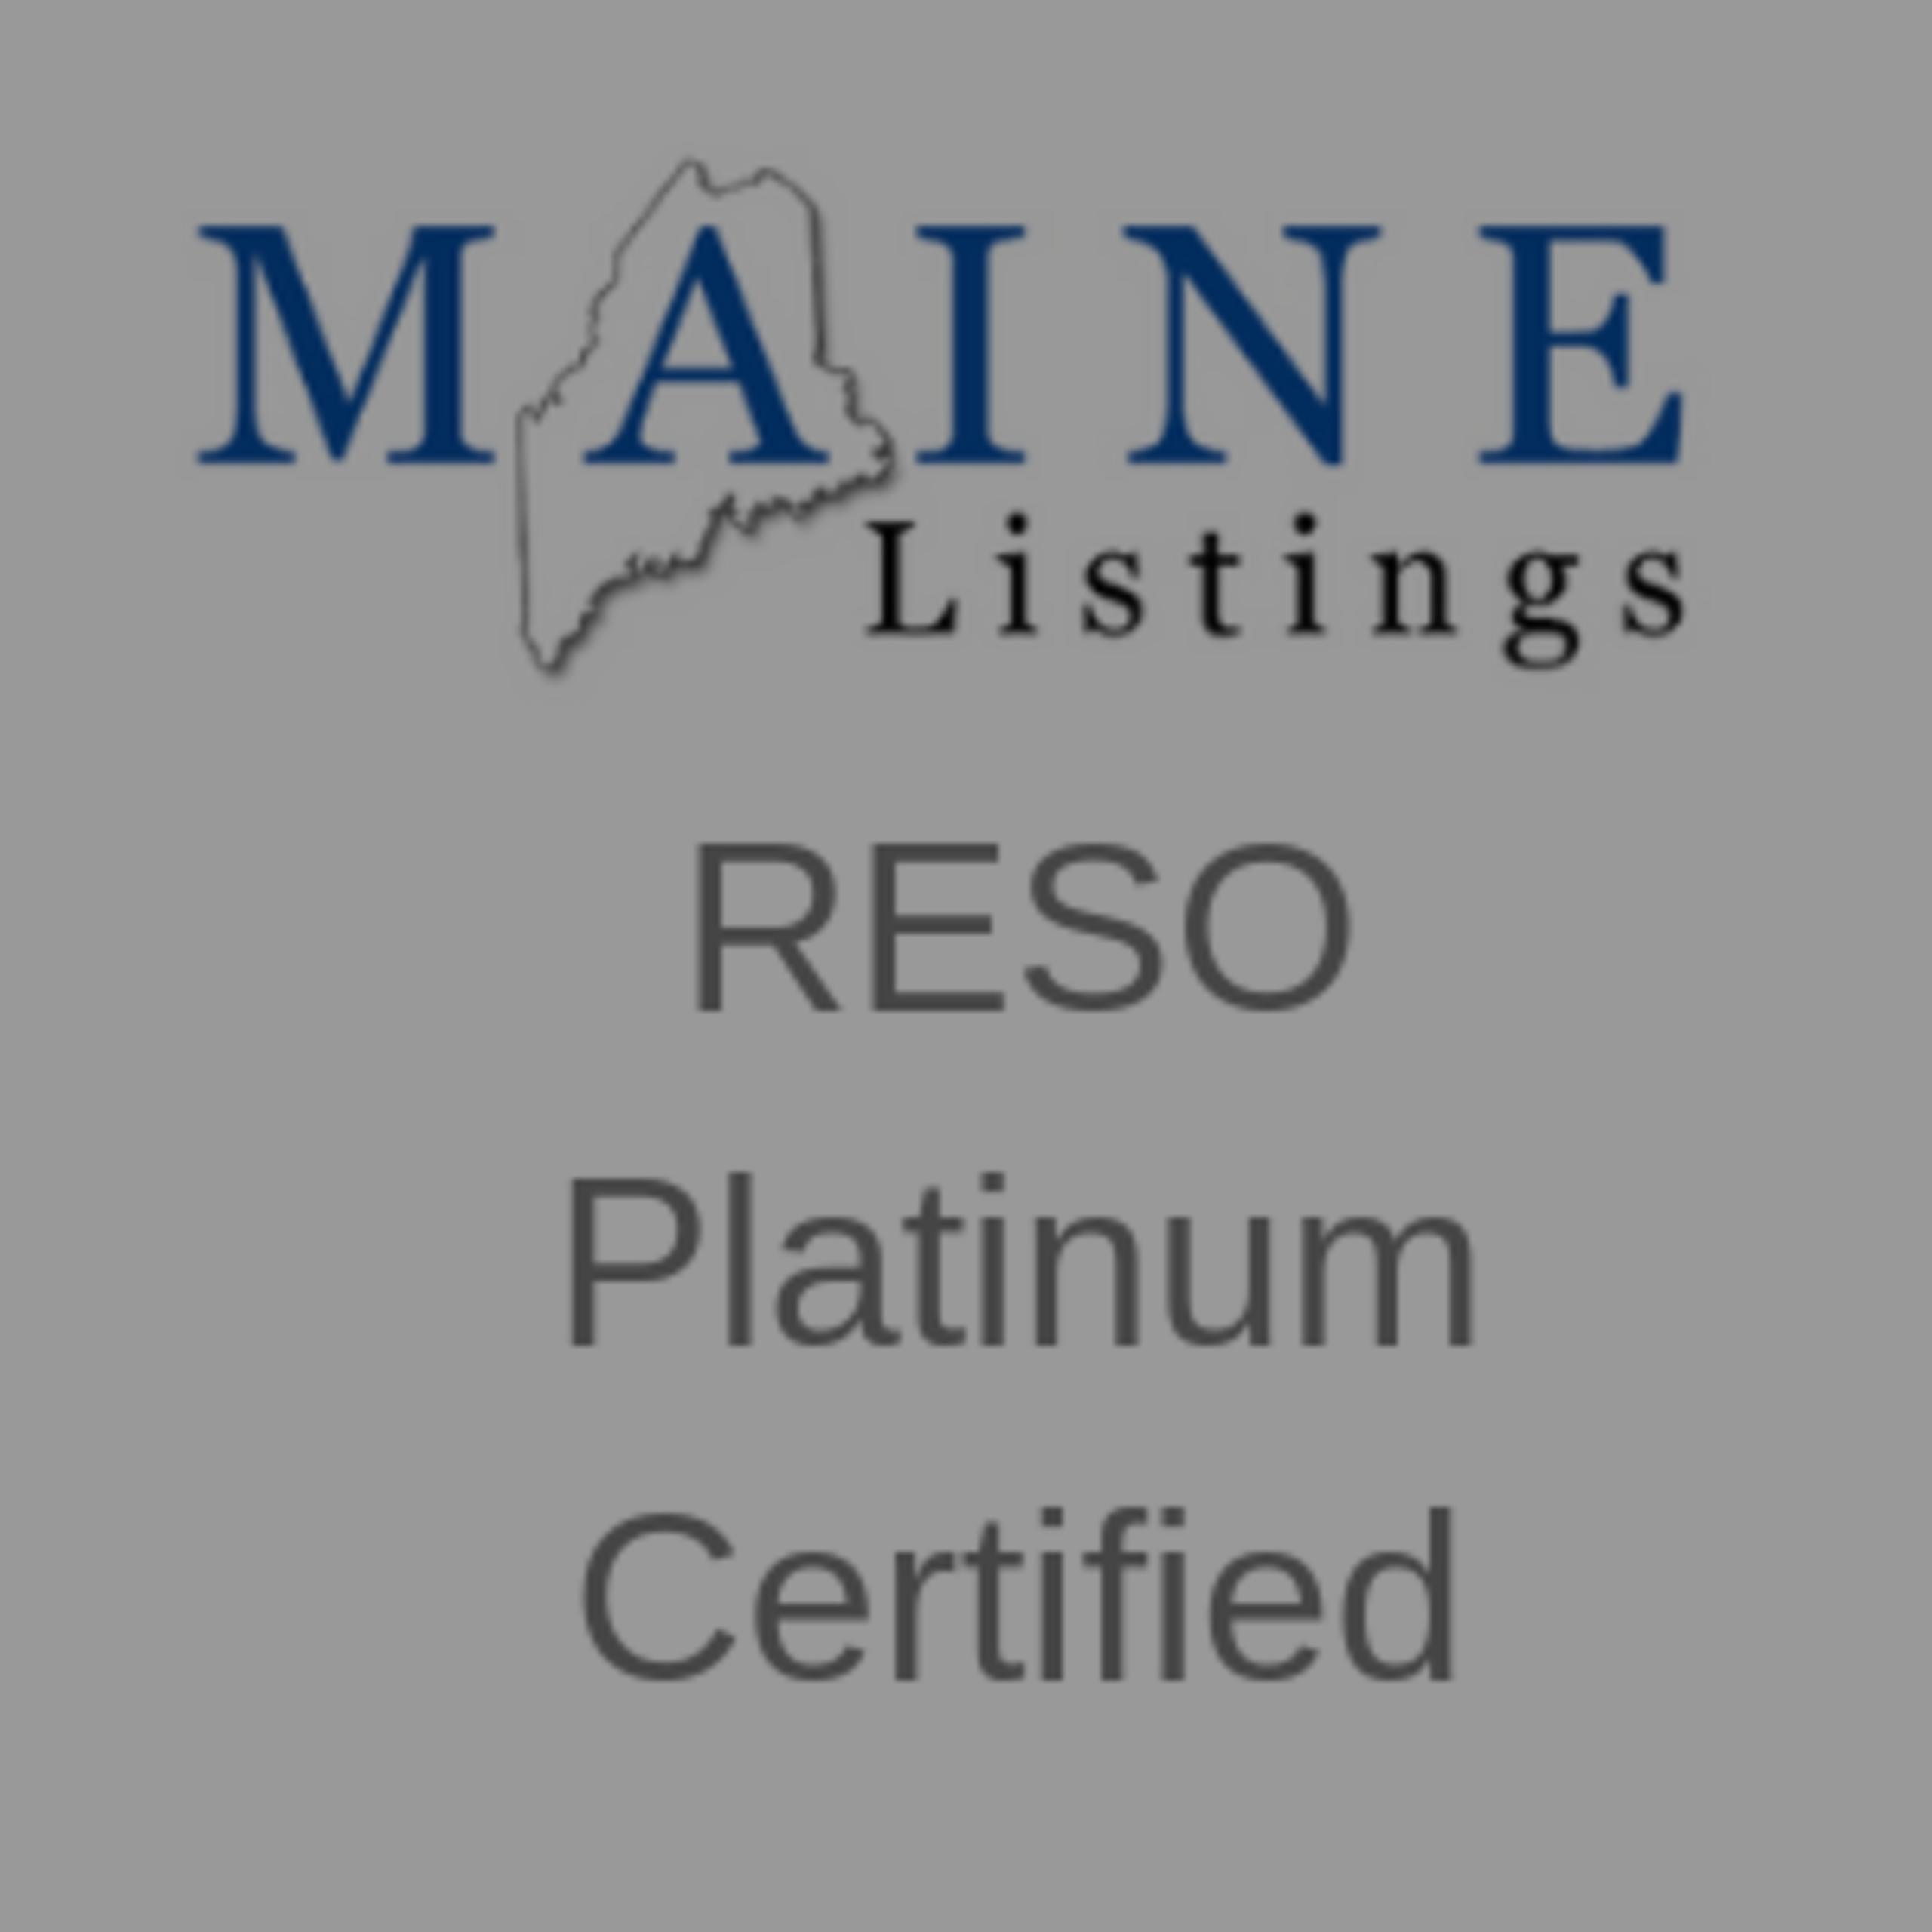 RESO Platinum Certified